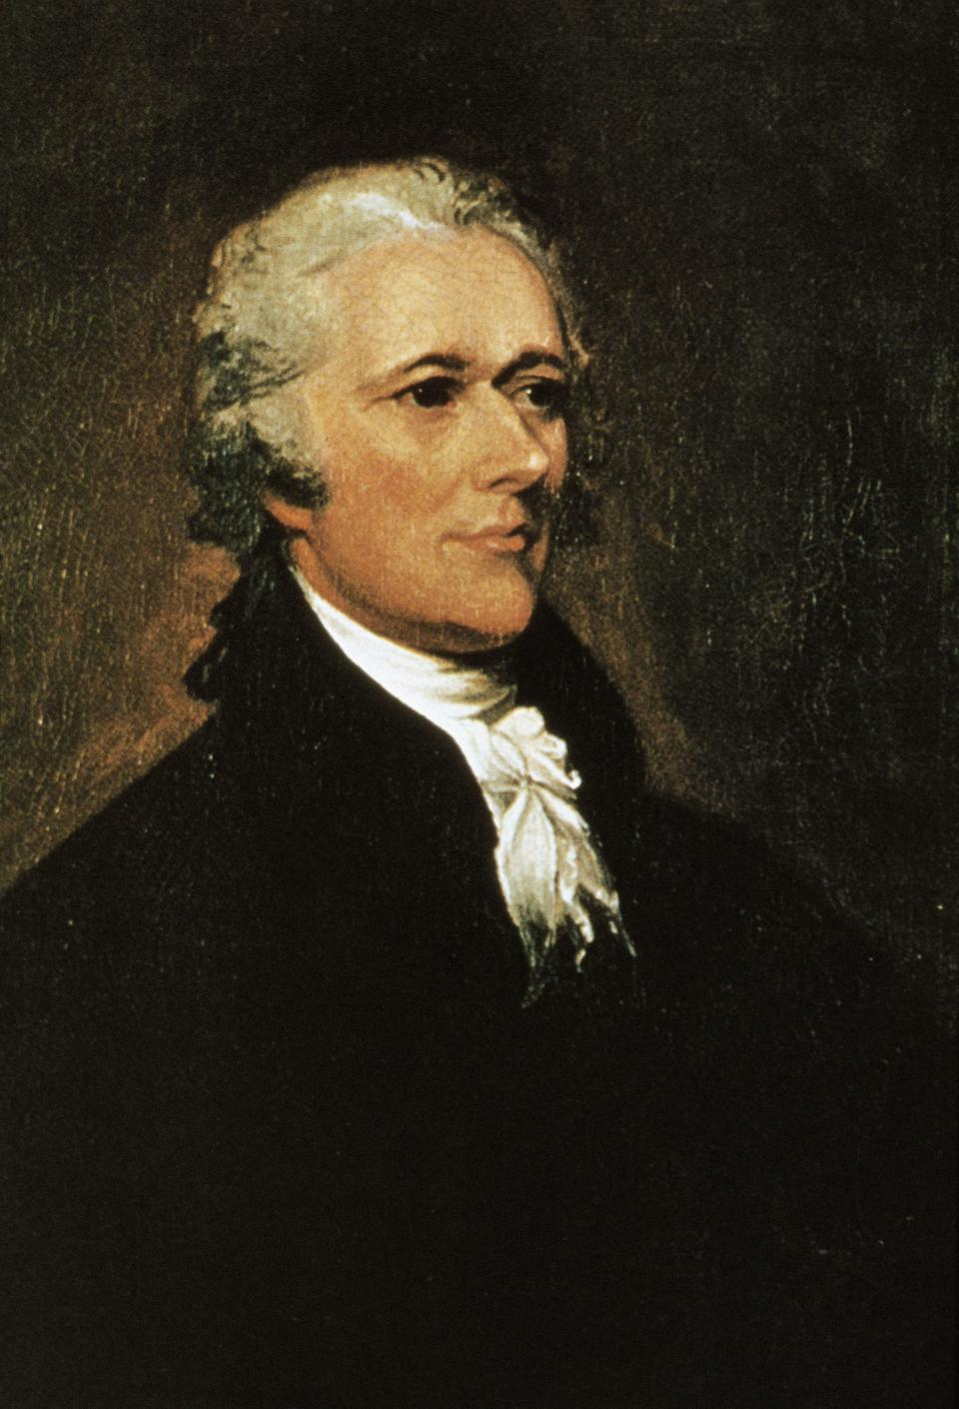 Portrait of Alexander Hamilton...